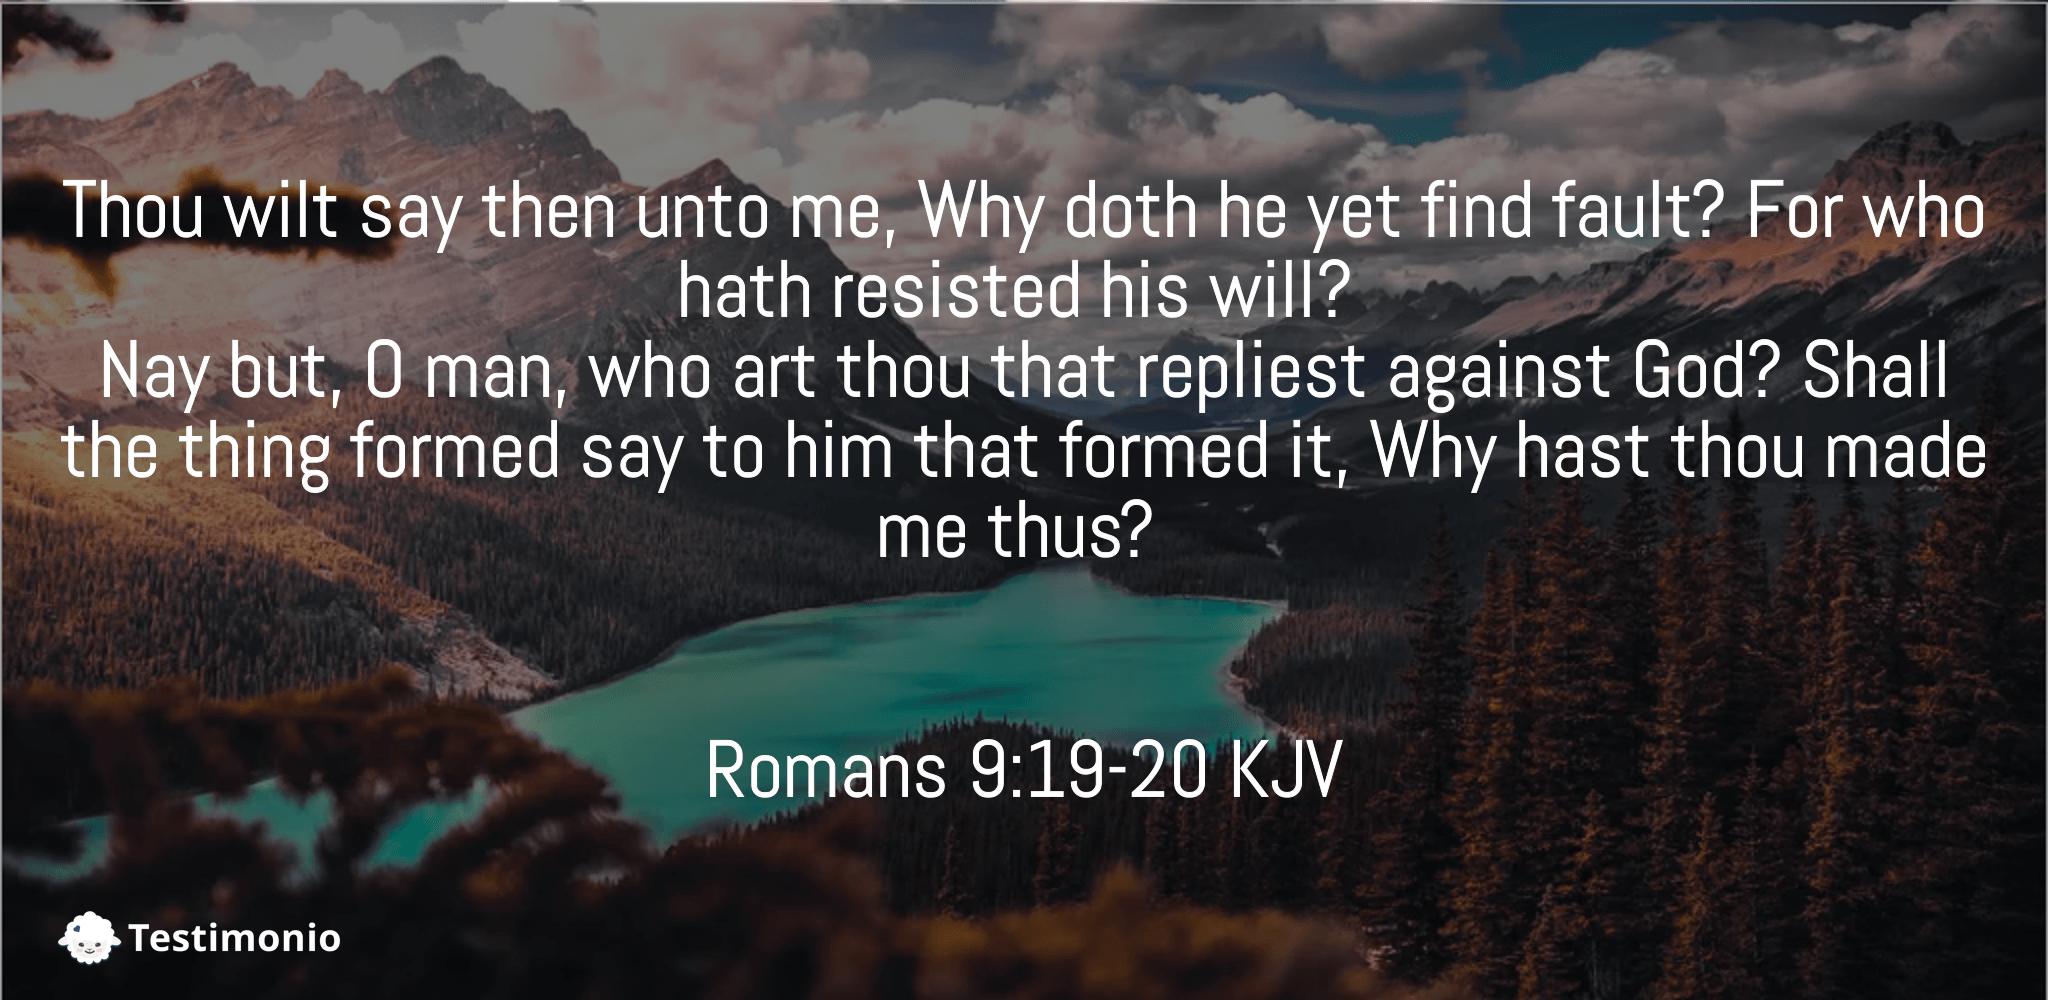 Romans 9:19-20